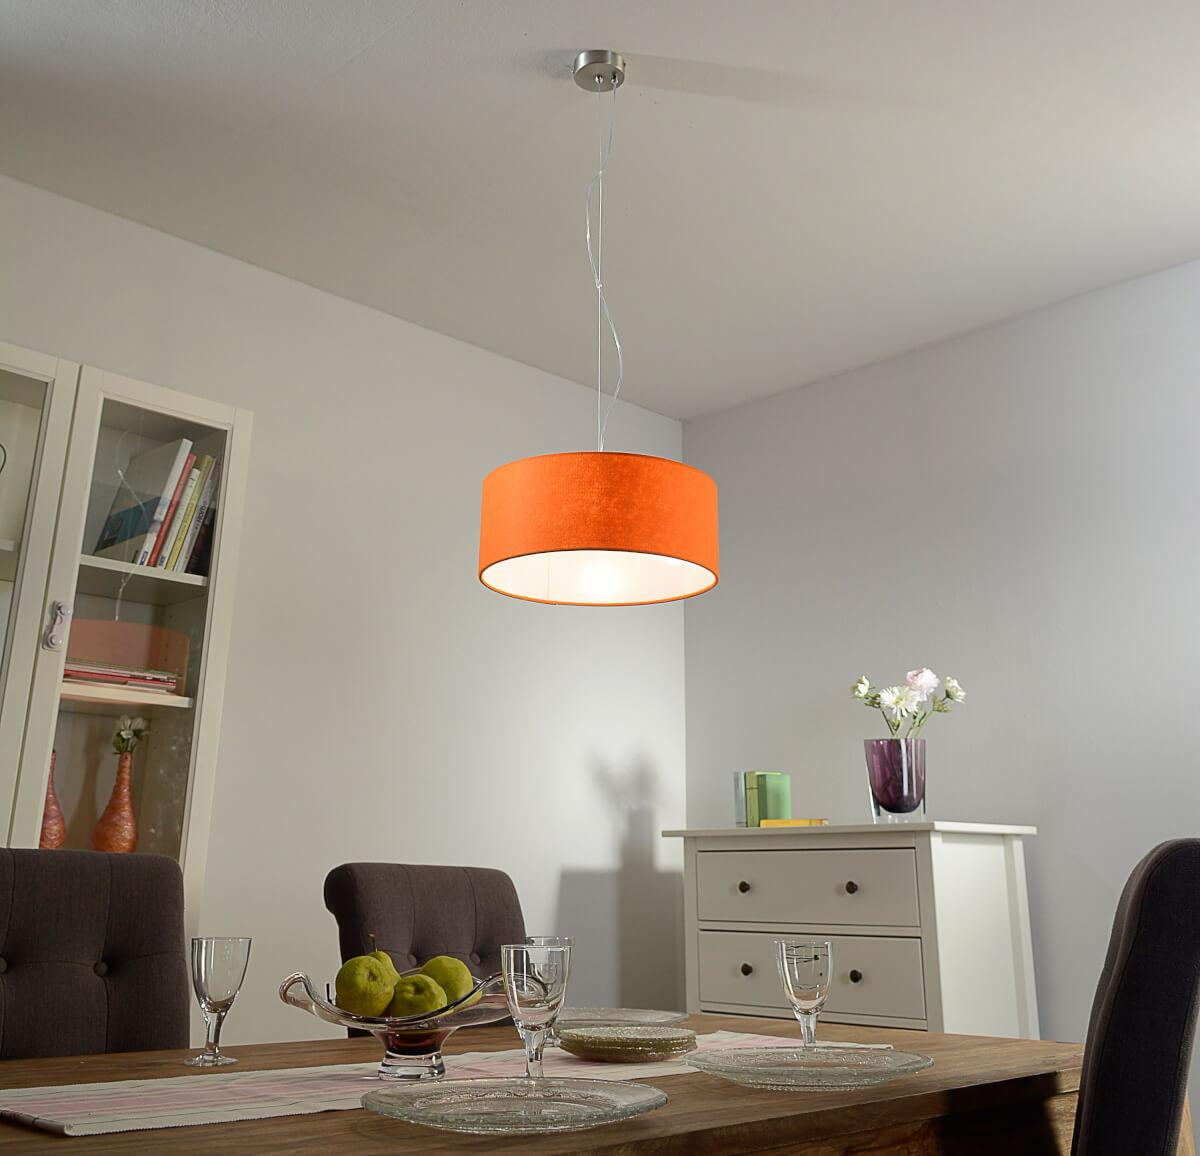 Vilten hanglamp